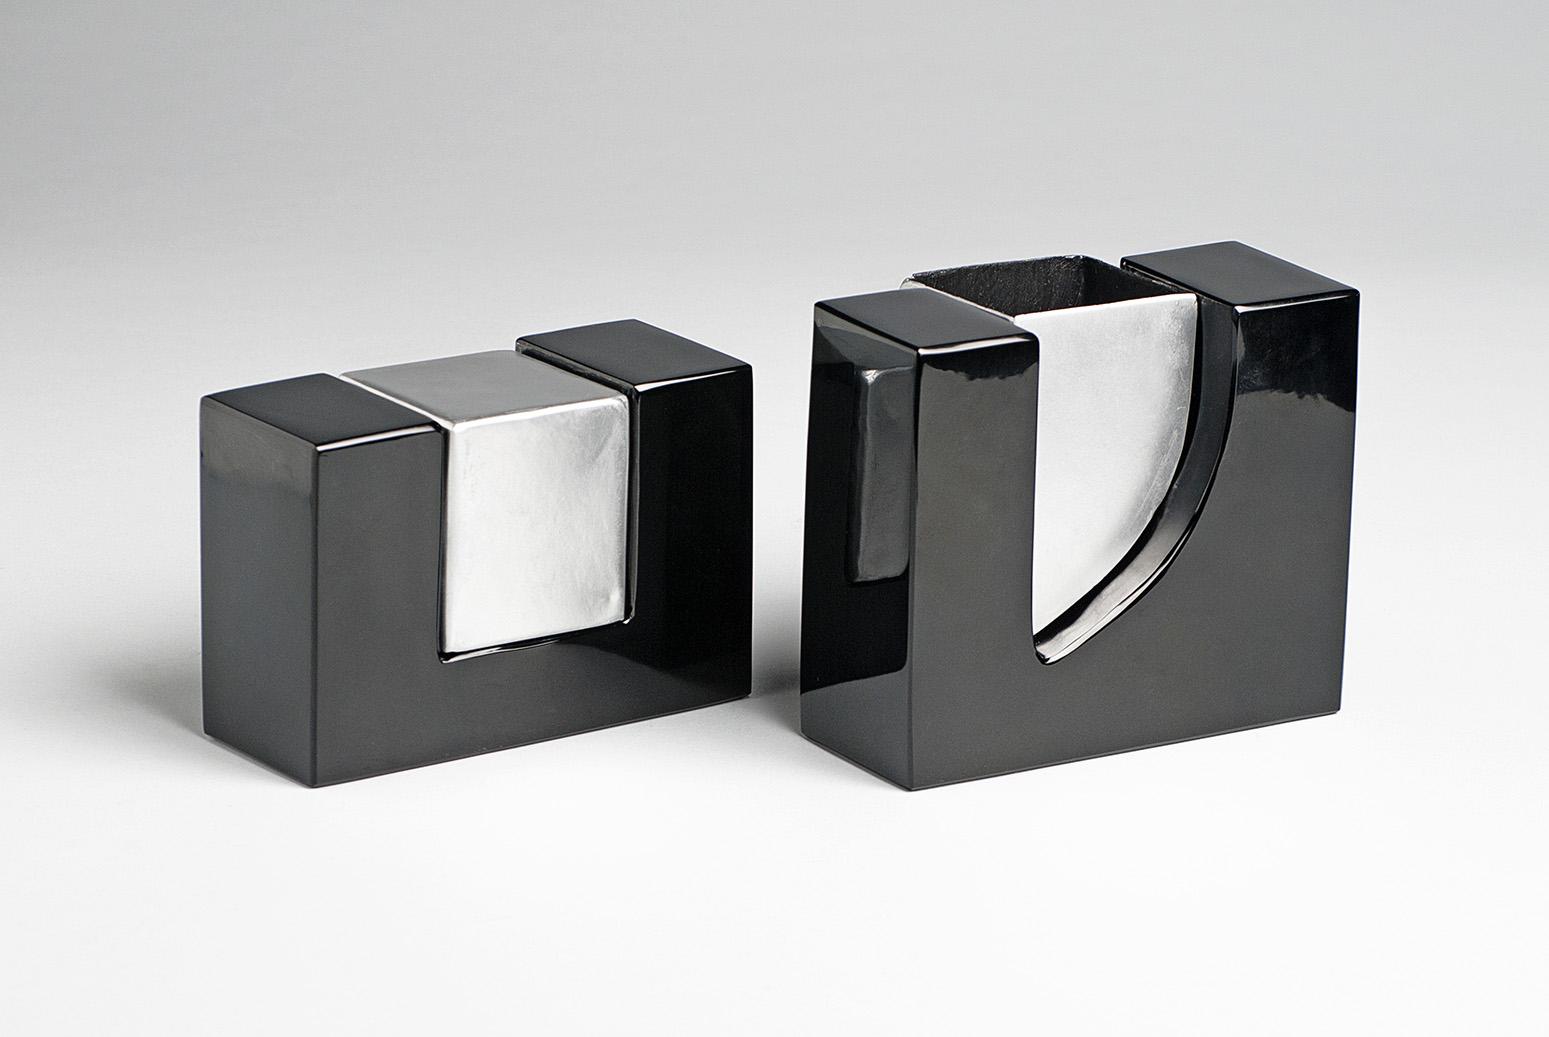 Osidian-bathroom-accessory-designer-Sharon Moussan-artisan-Mario Sandoval-Anahuac-MarionFriedmann-MexicoDesignTime copy 216.jpg